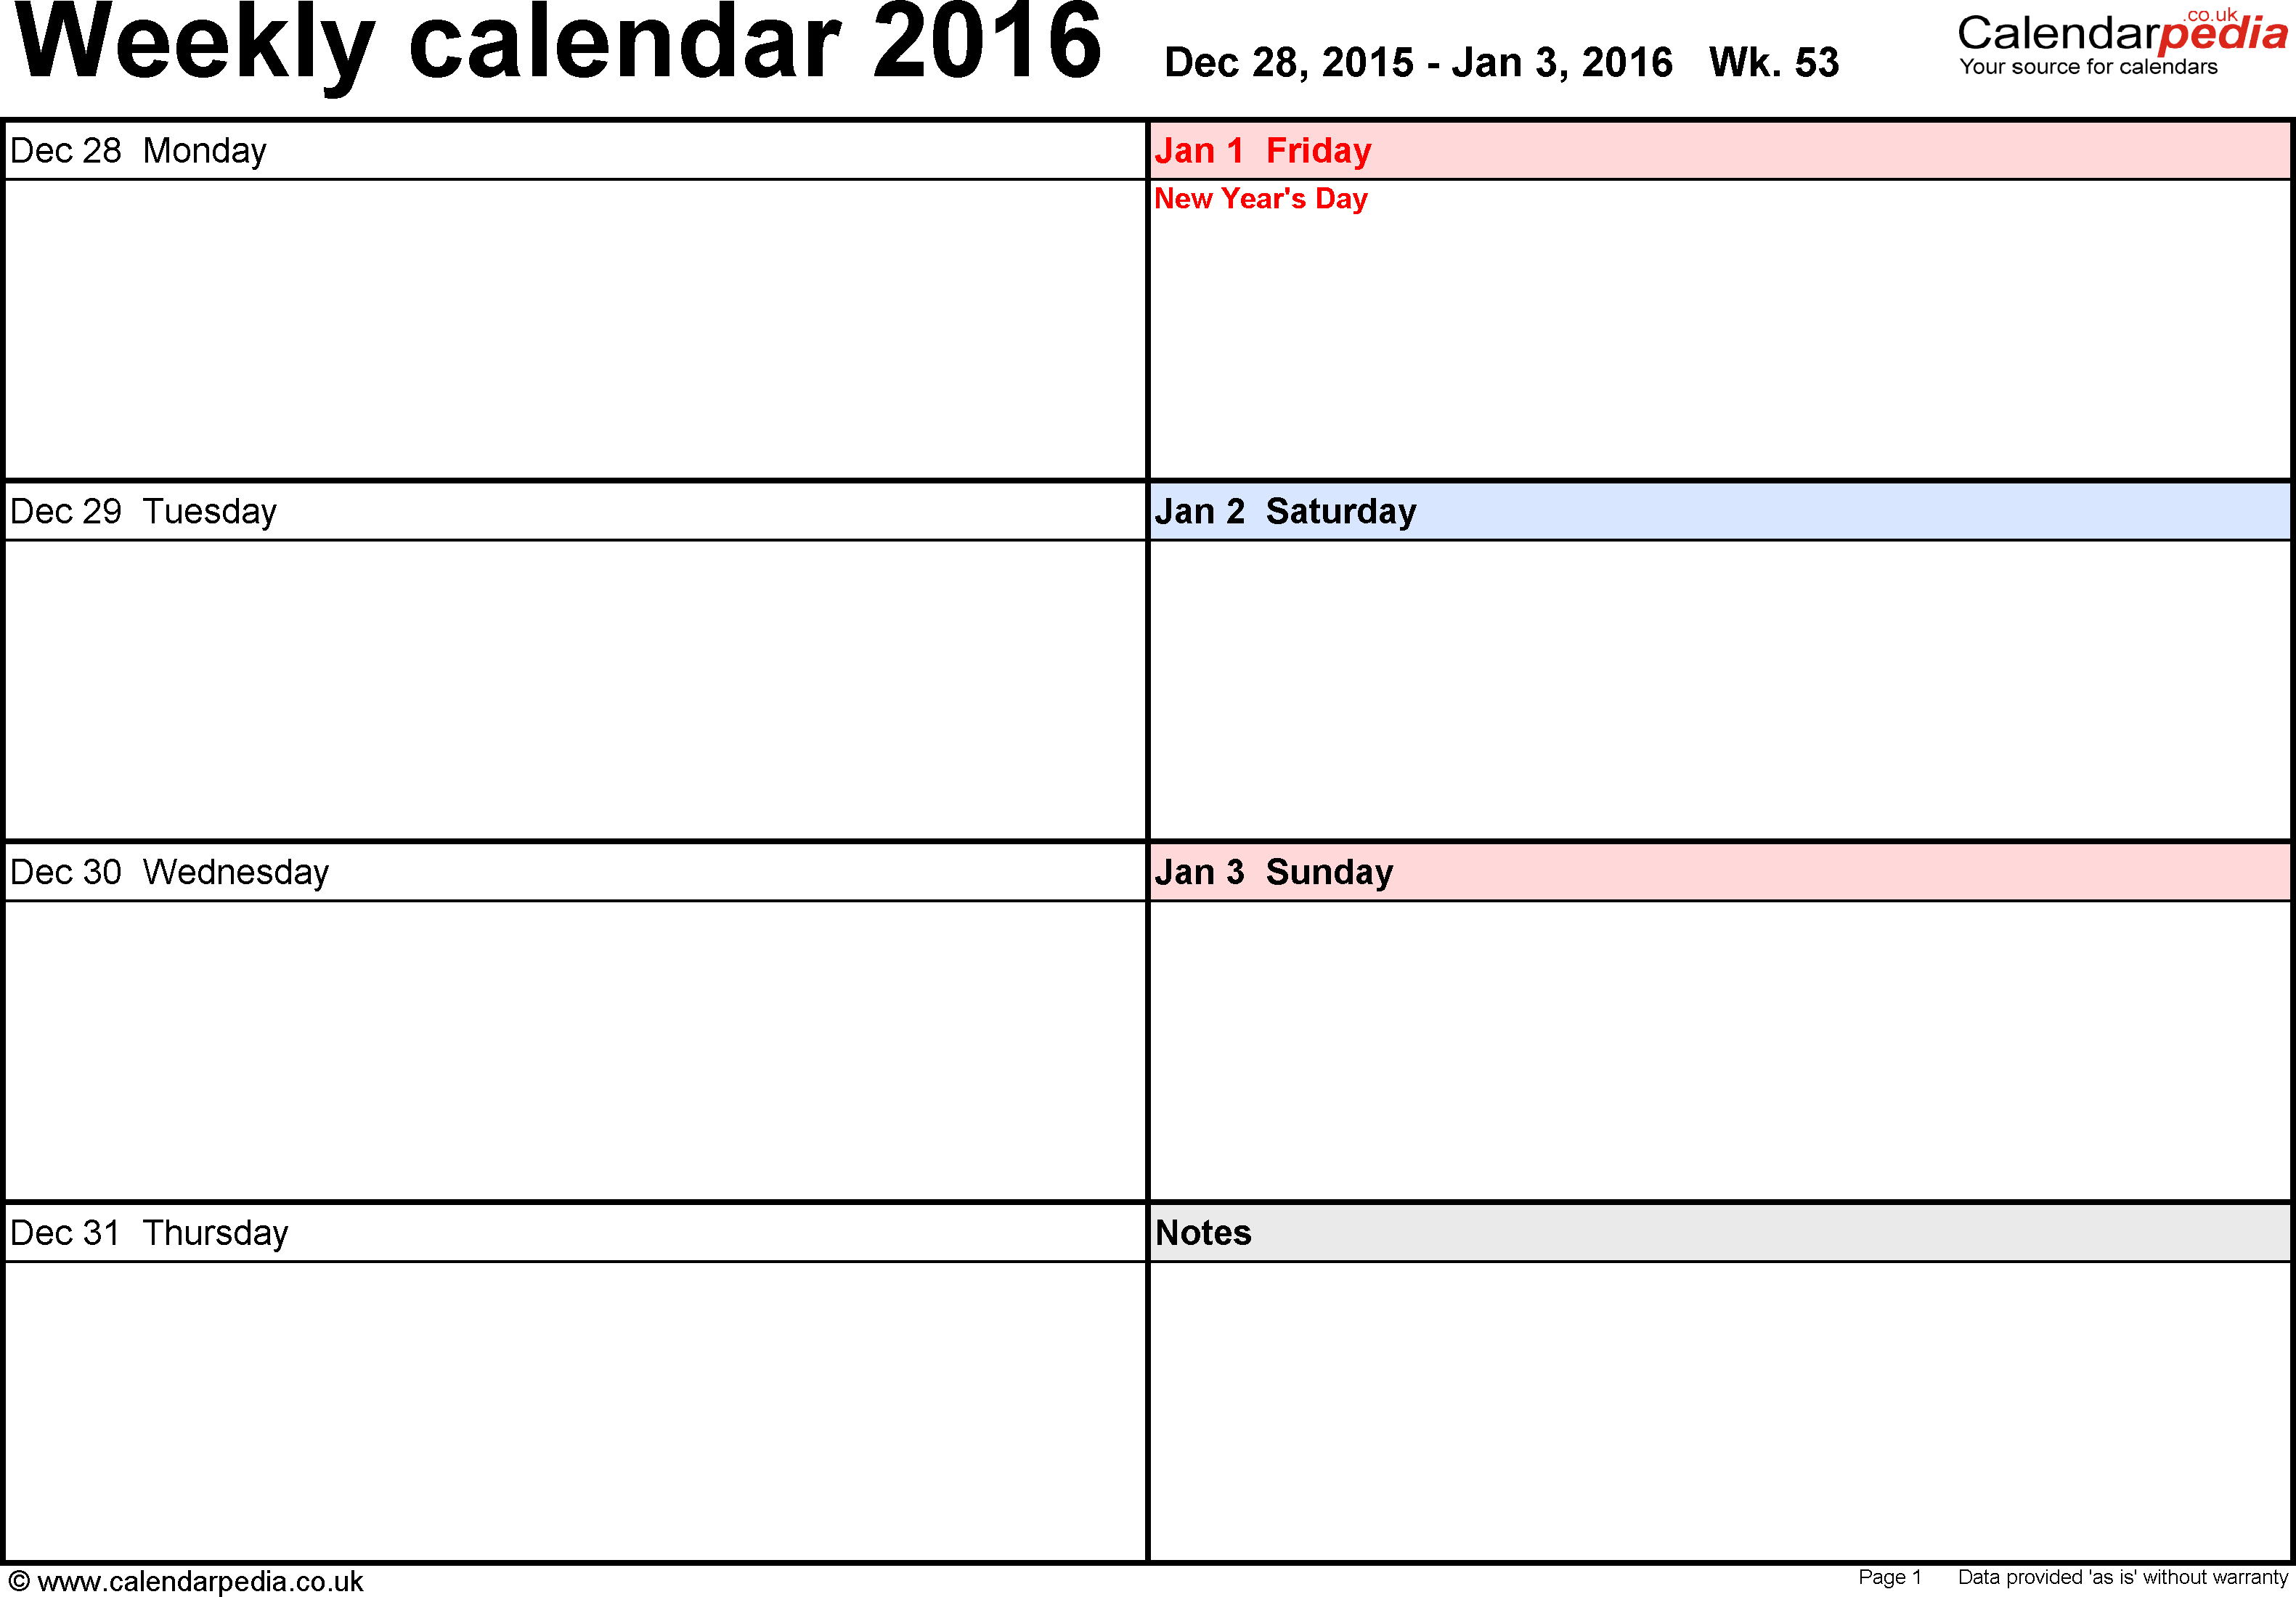 Calendar Templates - Calendarpedia.co.uk | Weekly Calendar